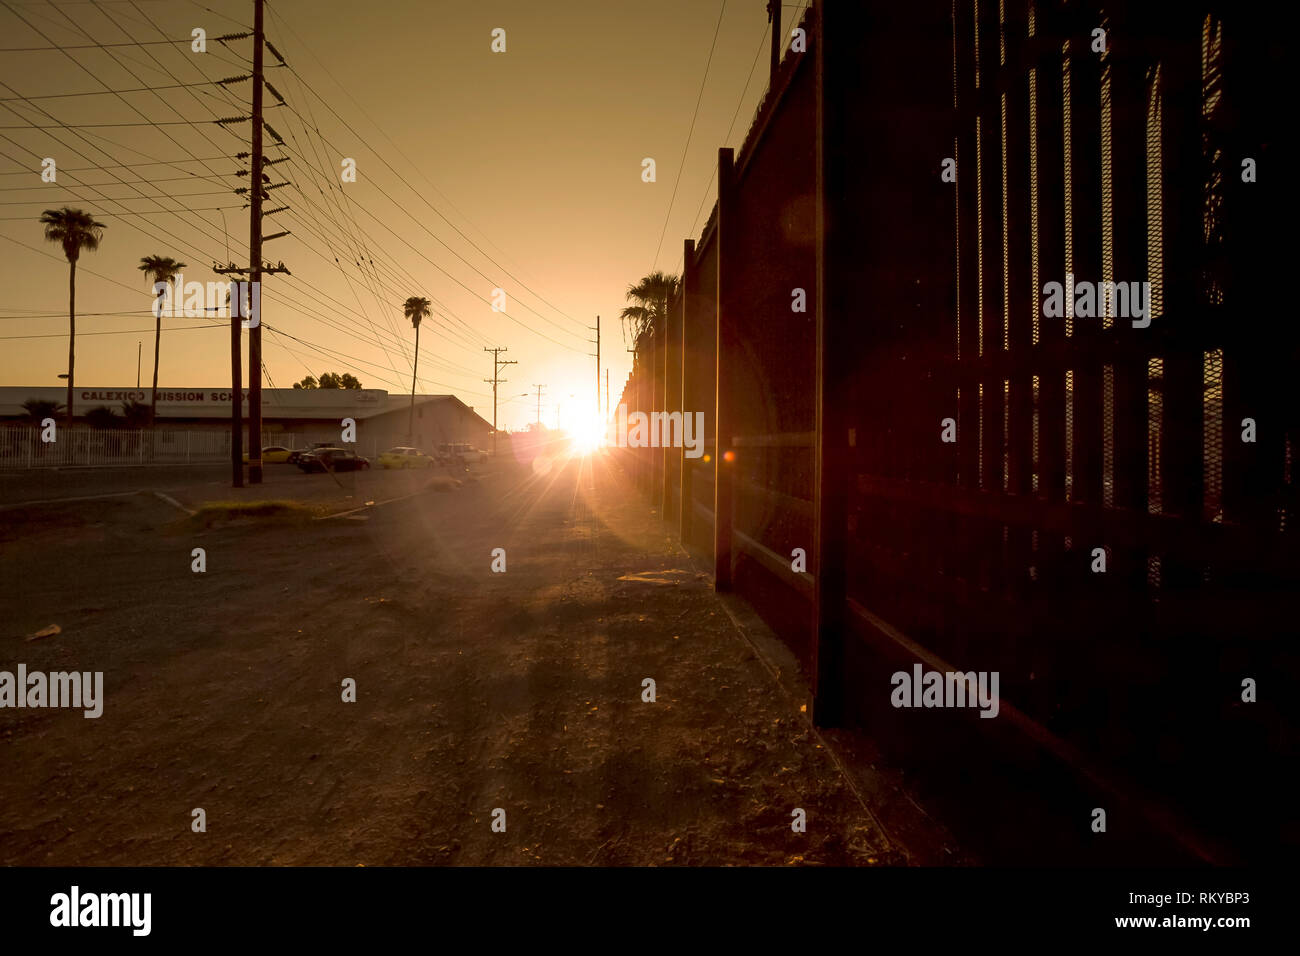 Sunrise along the border fence separating the United States and Mexico. - Stock Image